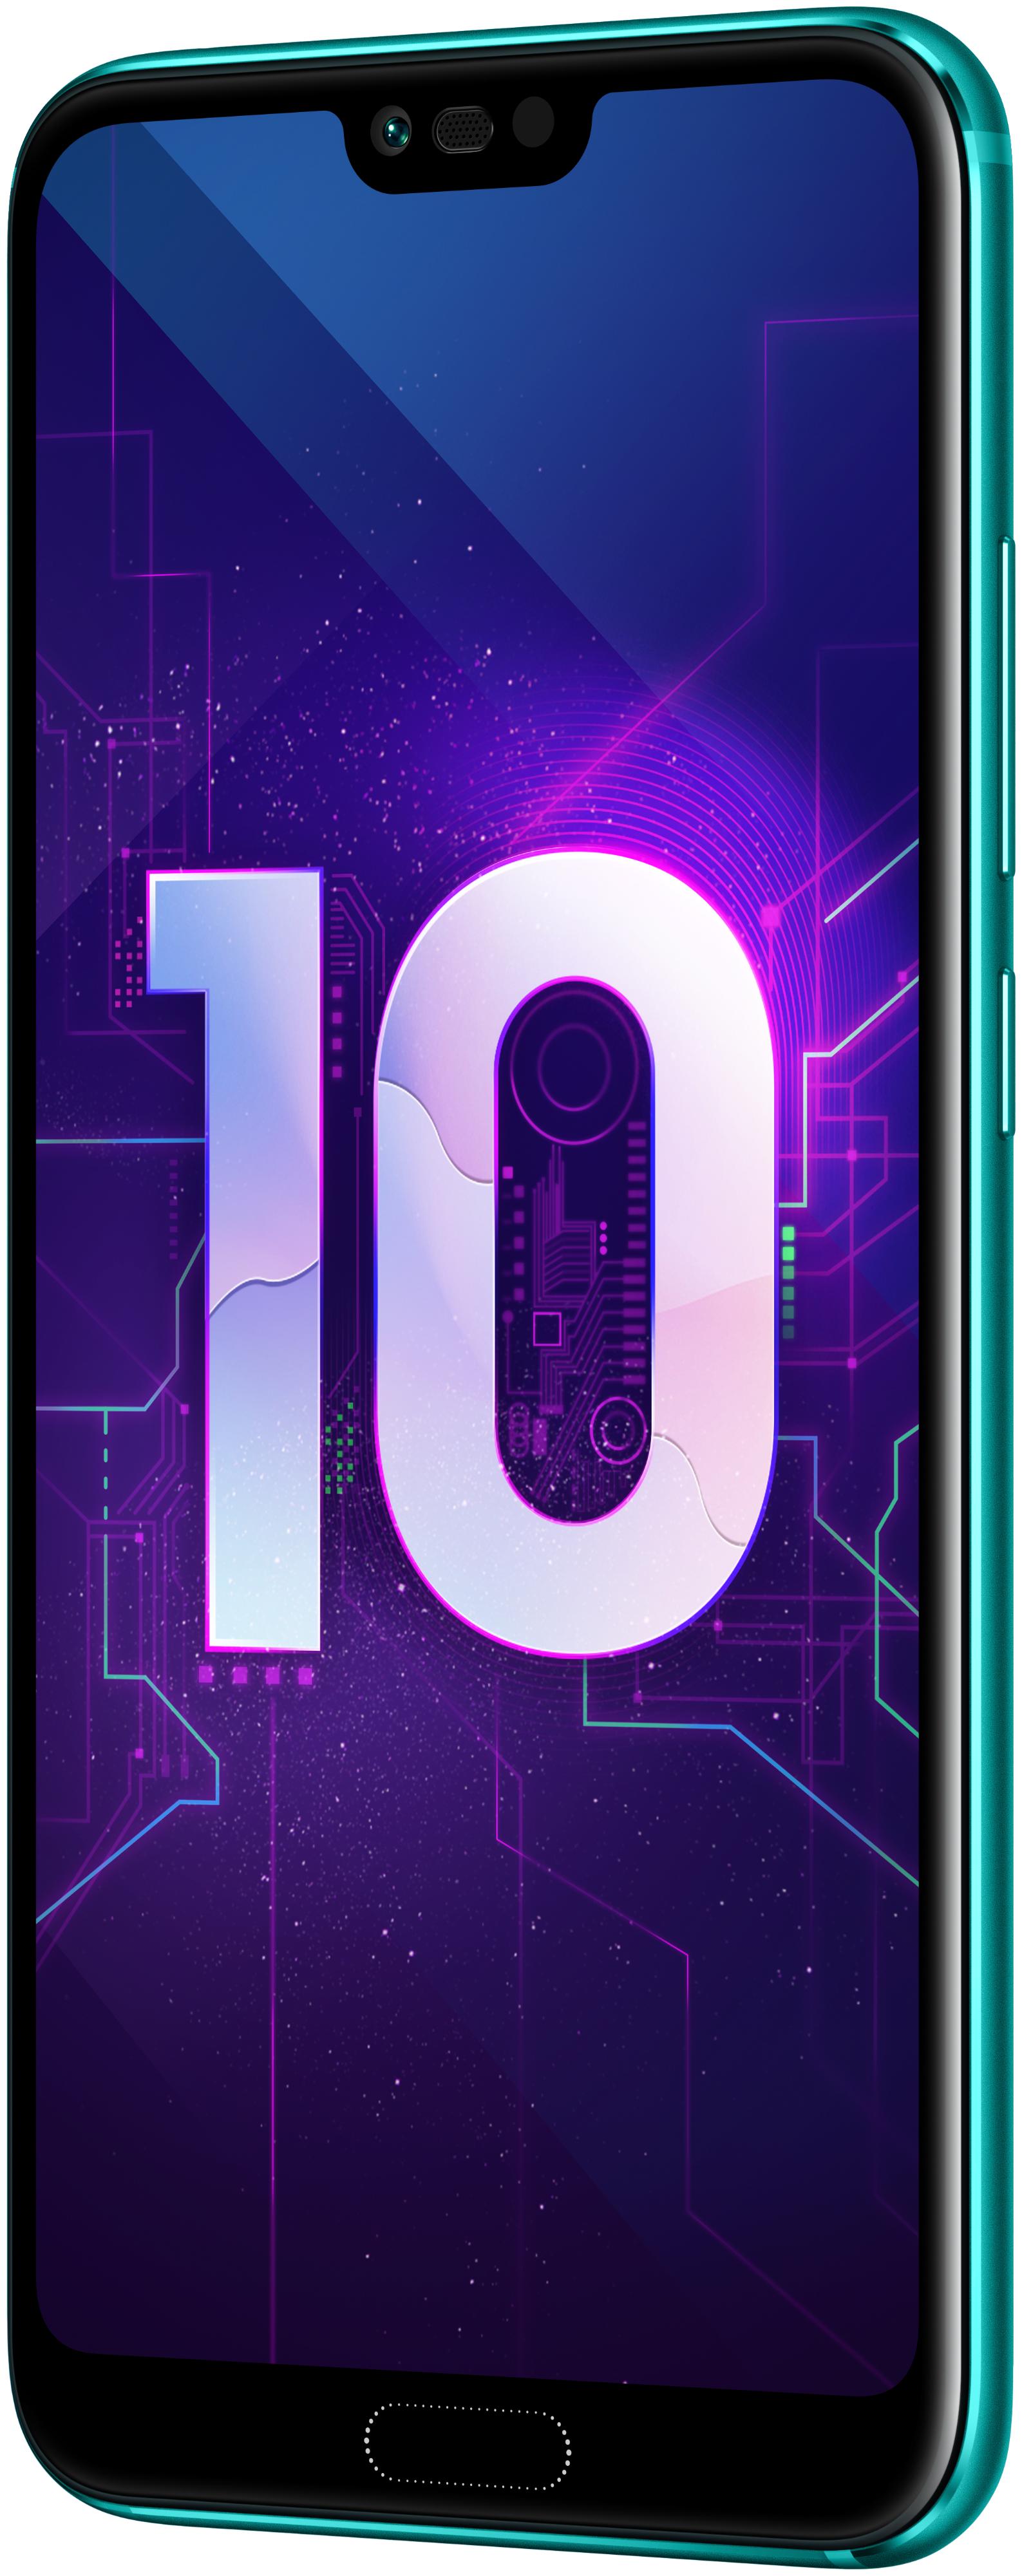 HONOR 10 4/64GB - аккумулятор: 3400мА·ч